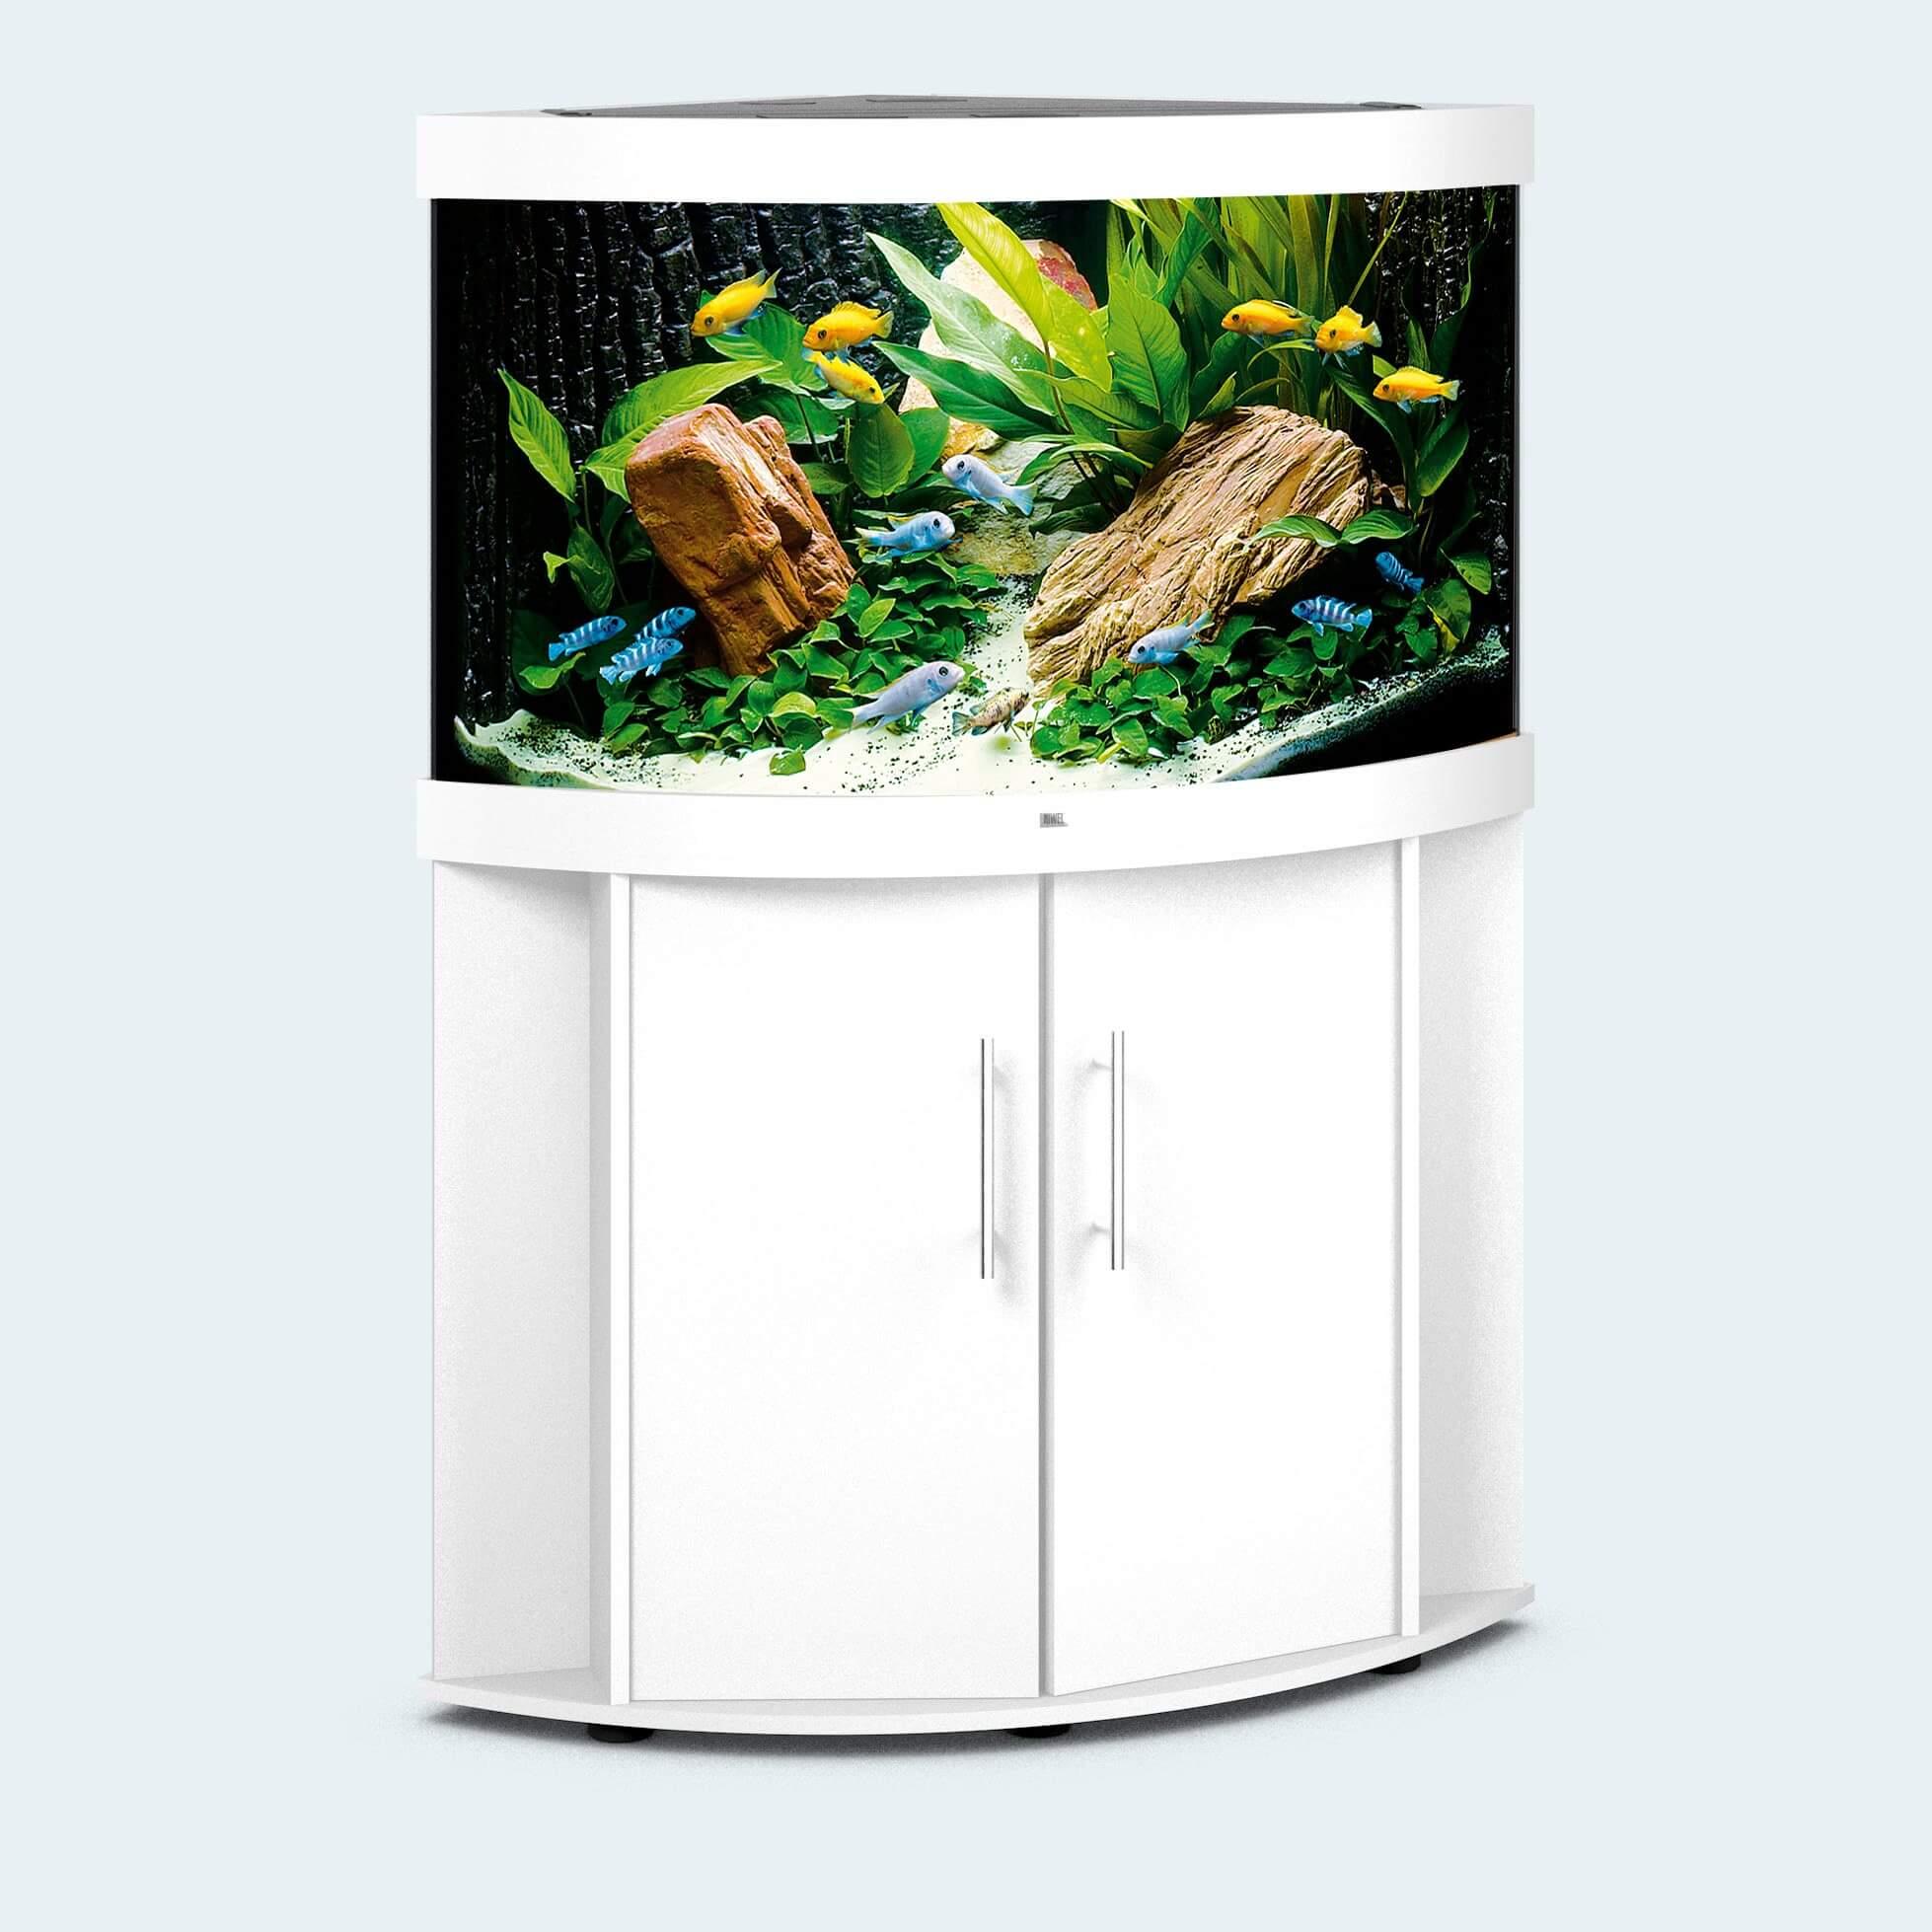 Aquarium Juwel Trigon 190 Led Blanc 389 52